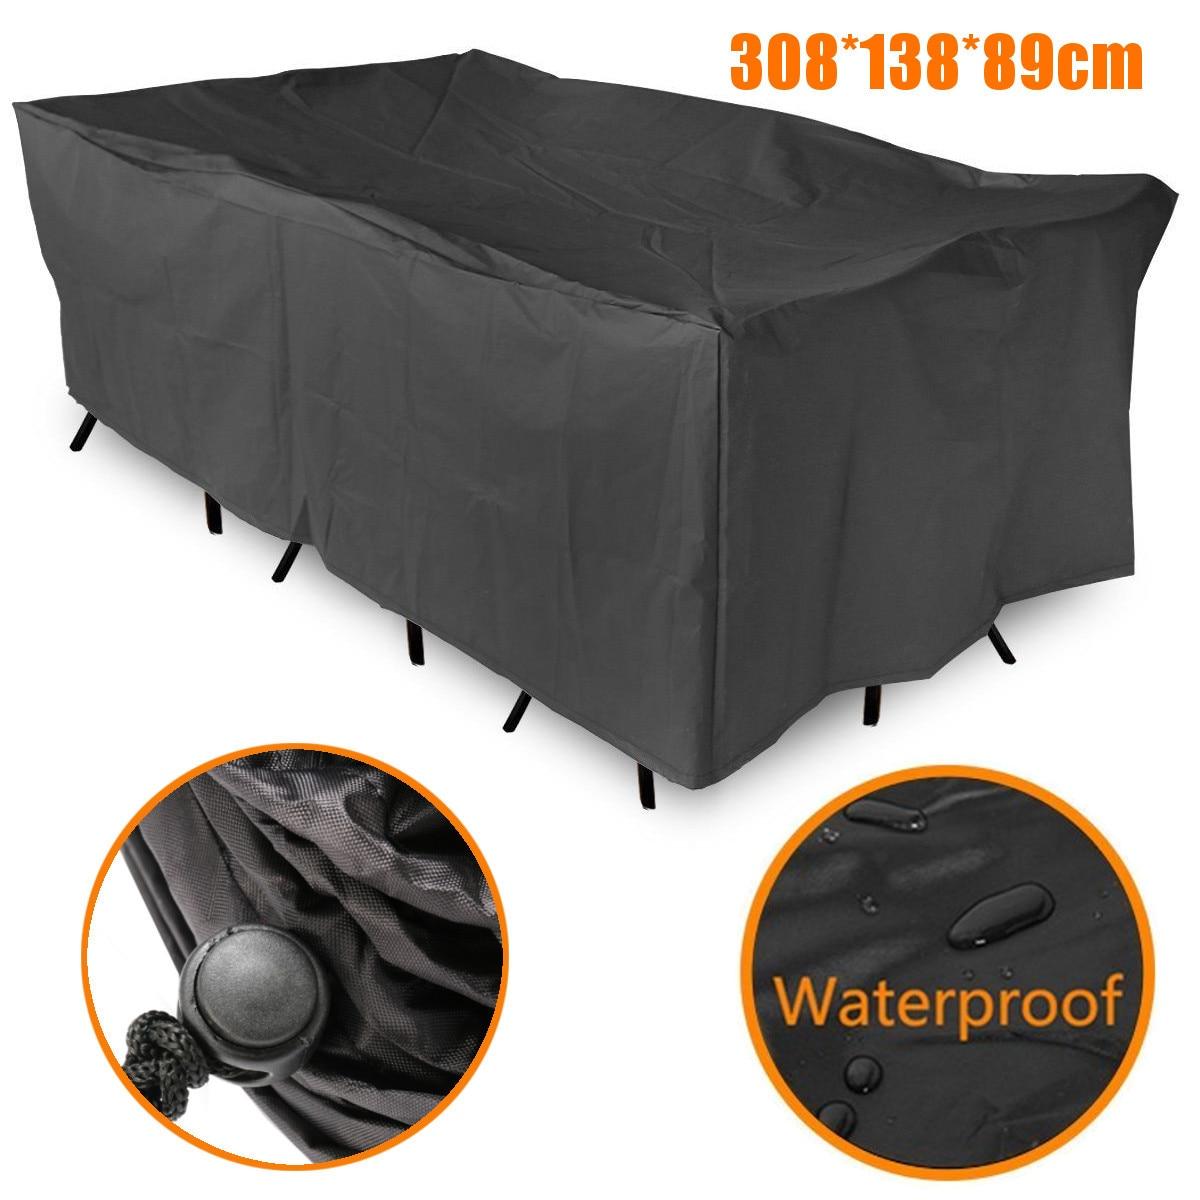 308x138cm Waterproof Patio Garden Furniture Cover Chair ...